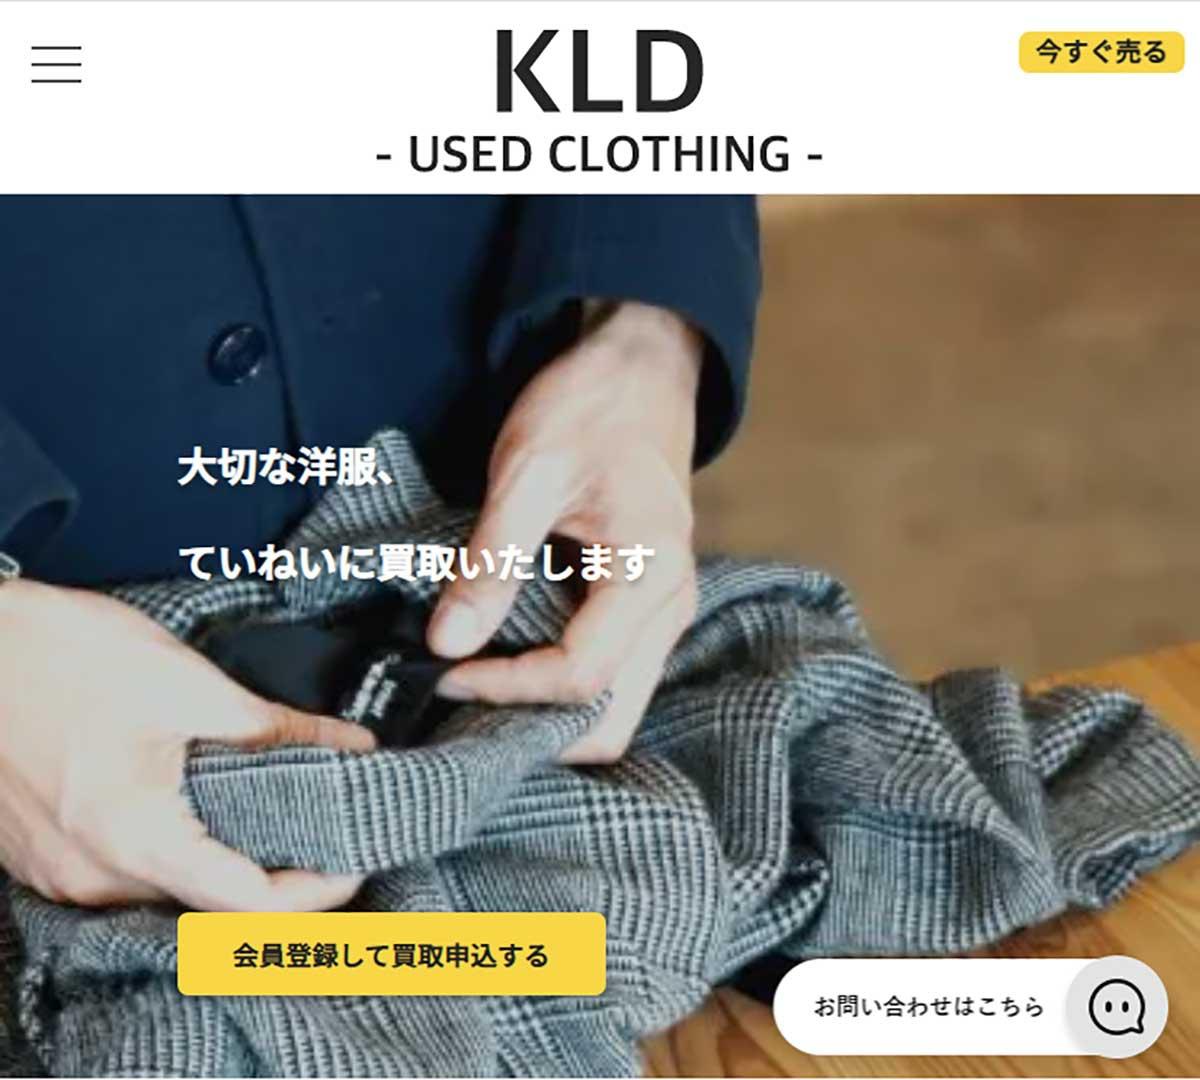 KLD WEBサイト